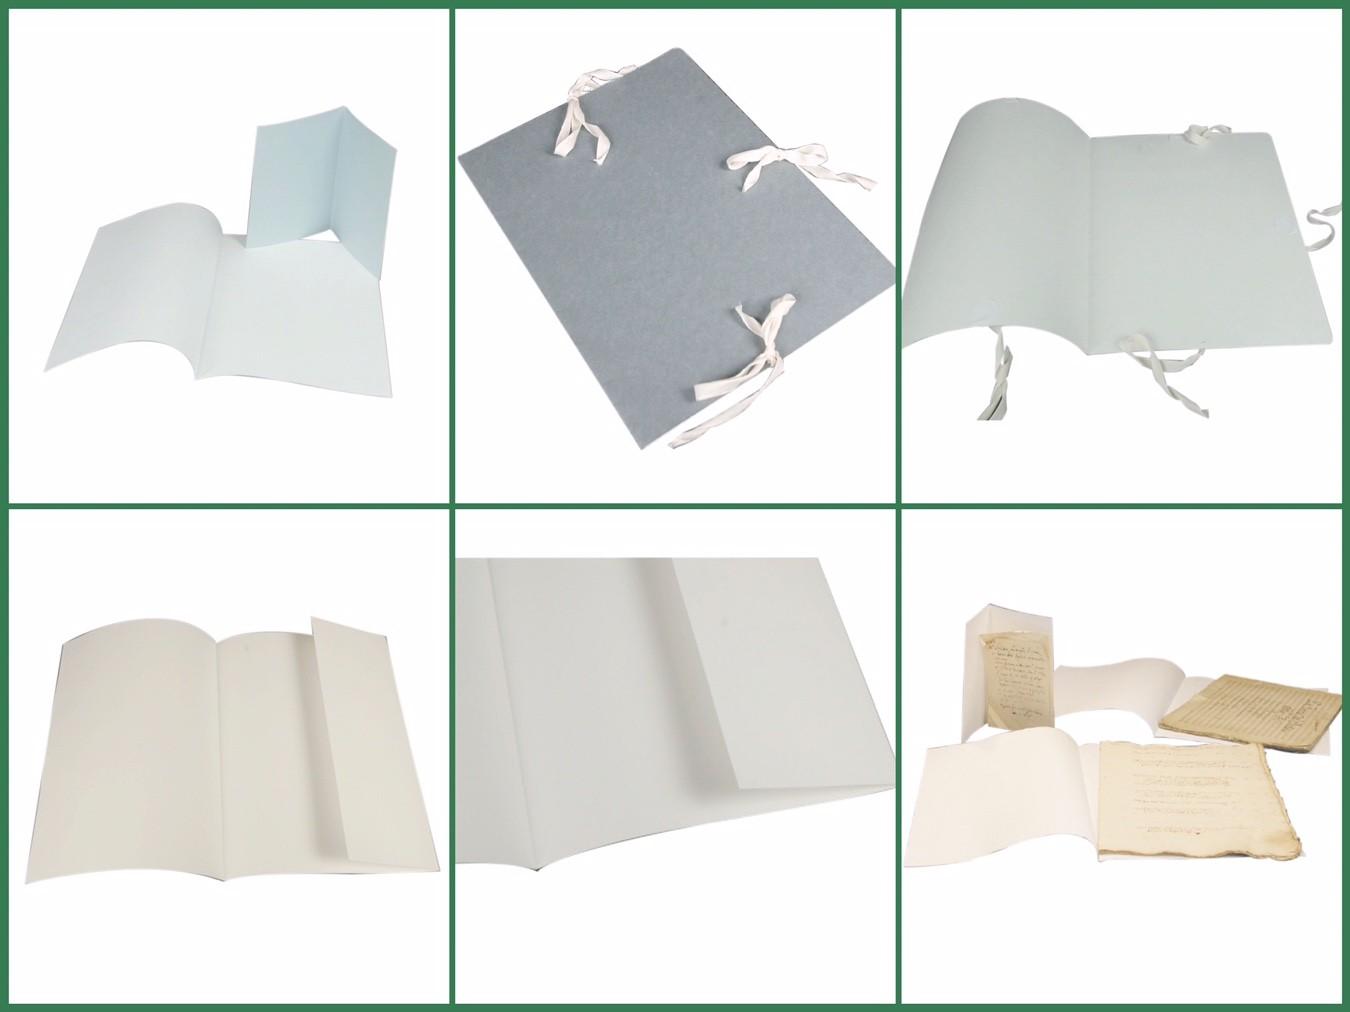 Single crease folders